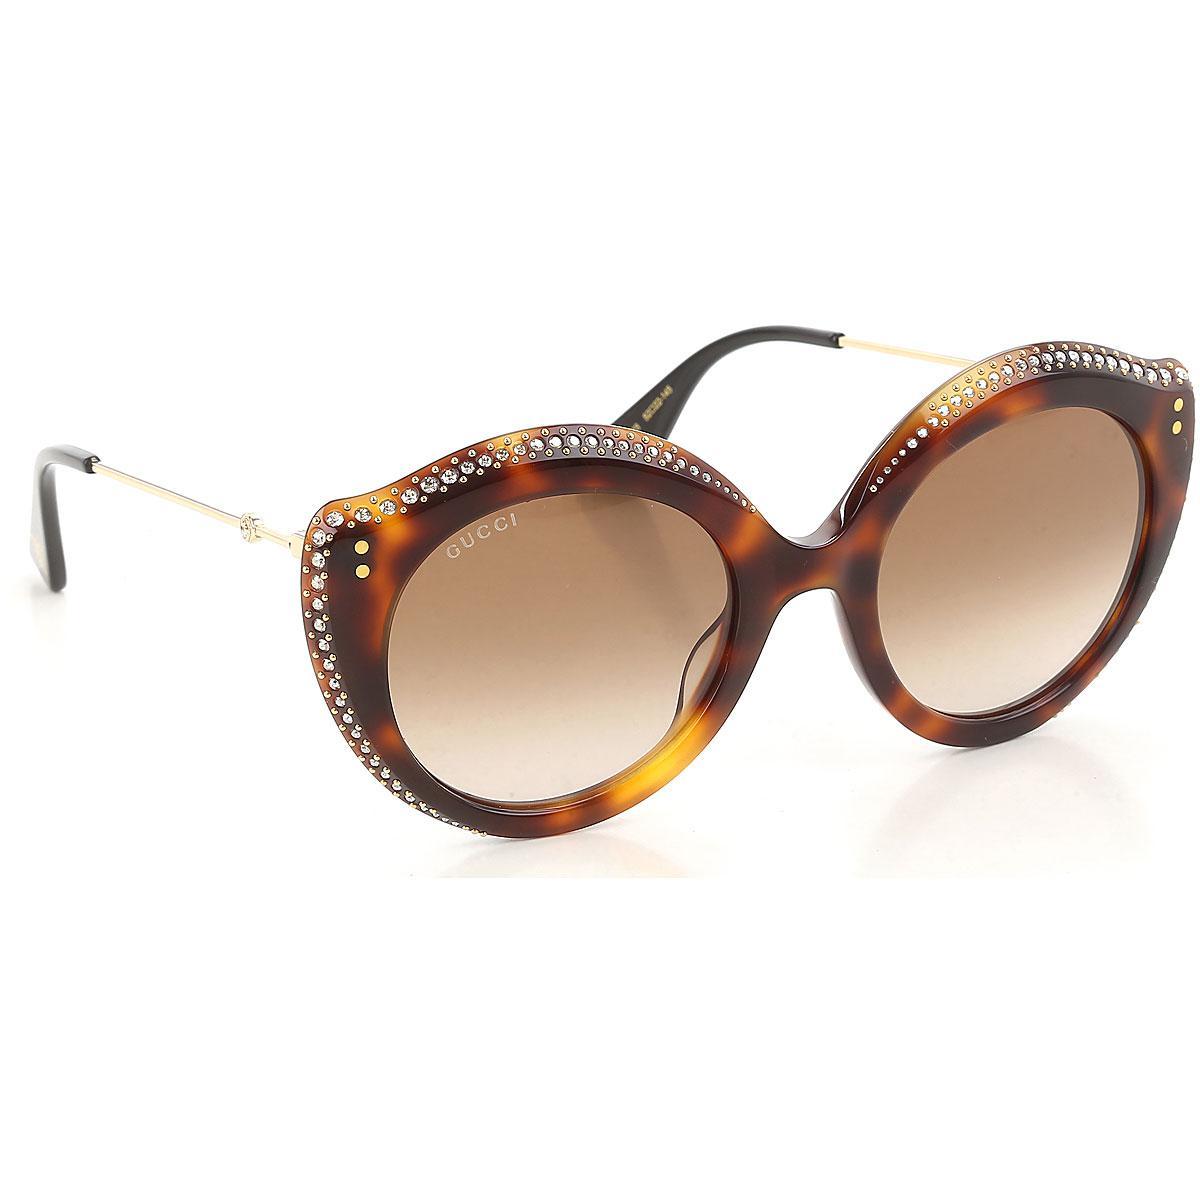 36ec6adb5f1 Gucci - Multicolor Sunglasses - Lyst. View fullscreen